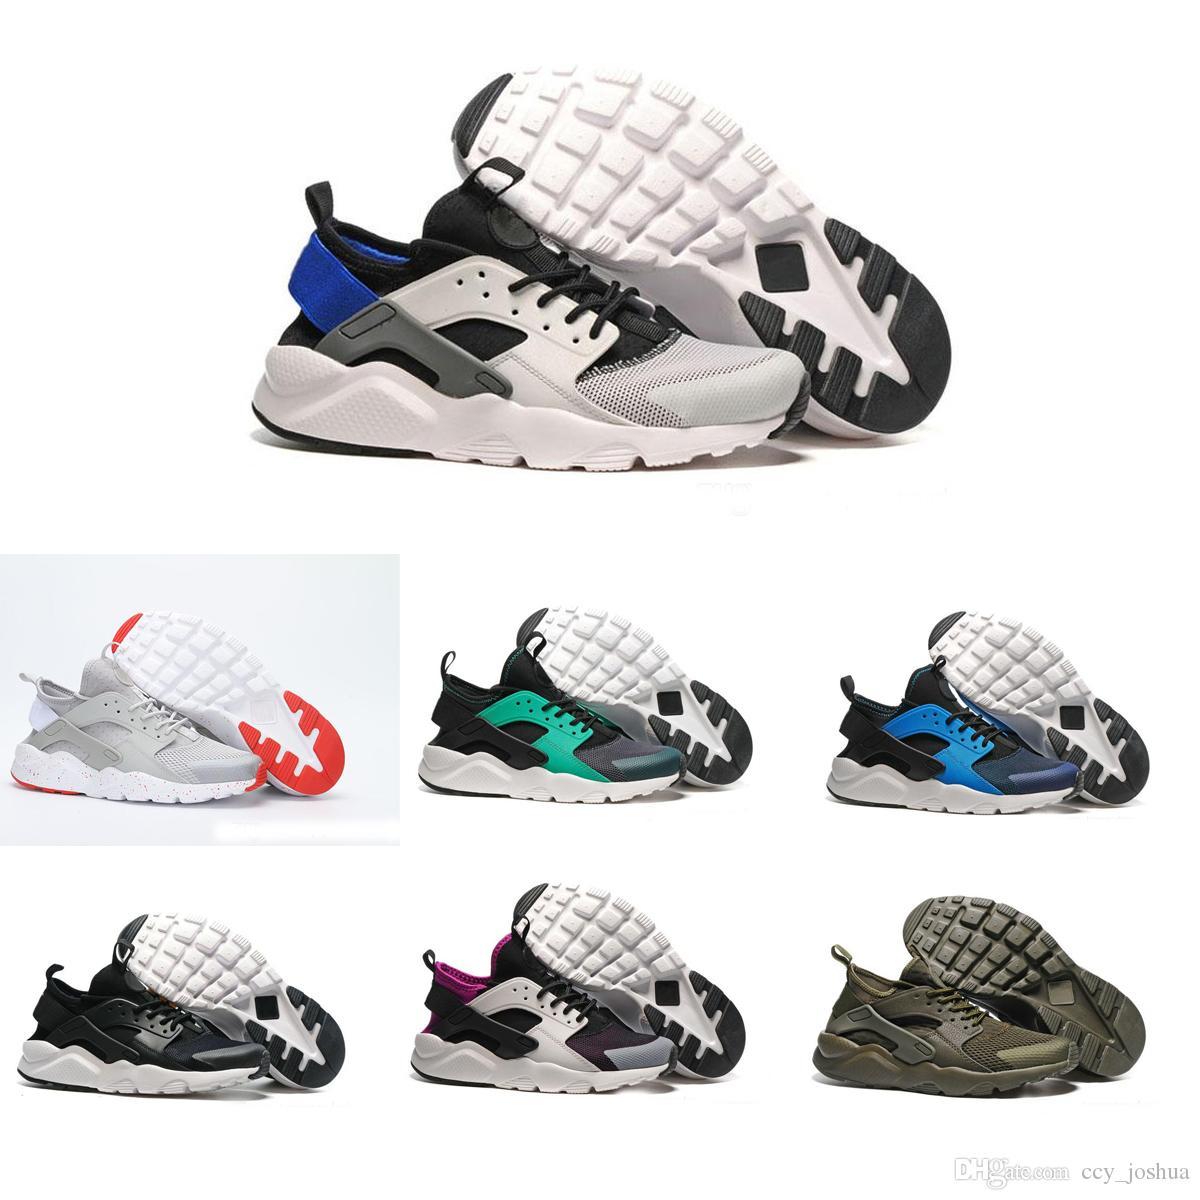 New Run Design Air Huarache 4 IV Running Shoes For Men&Women, Lightweight Huaraches Sneakers Athletic Sport Outdoor Harache hiking Shoes